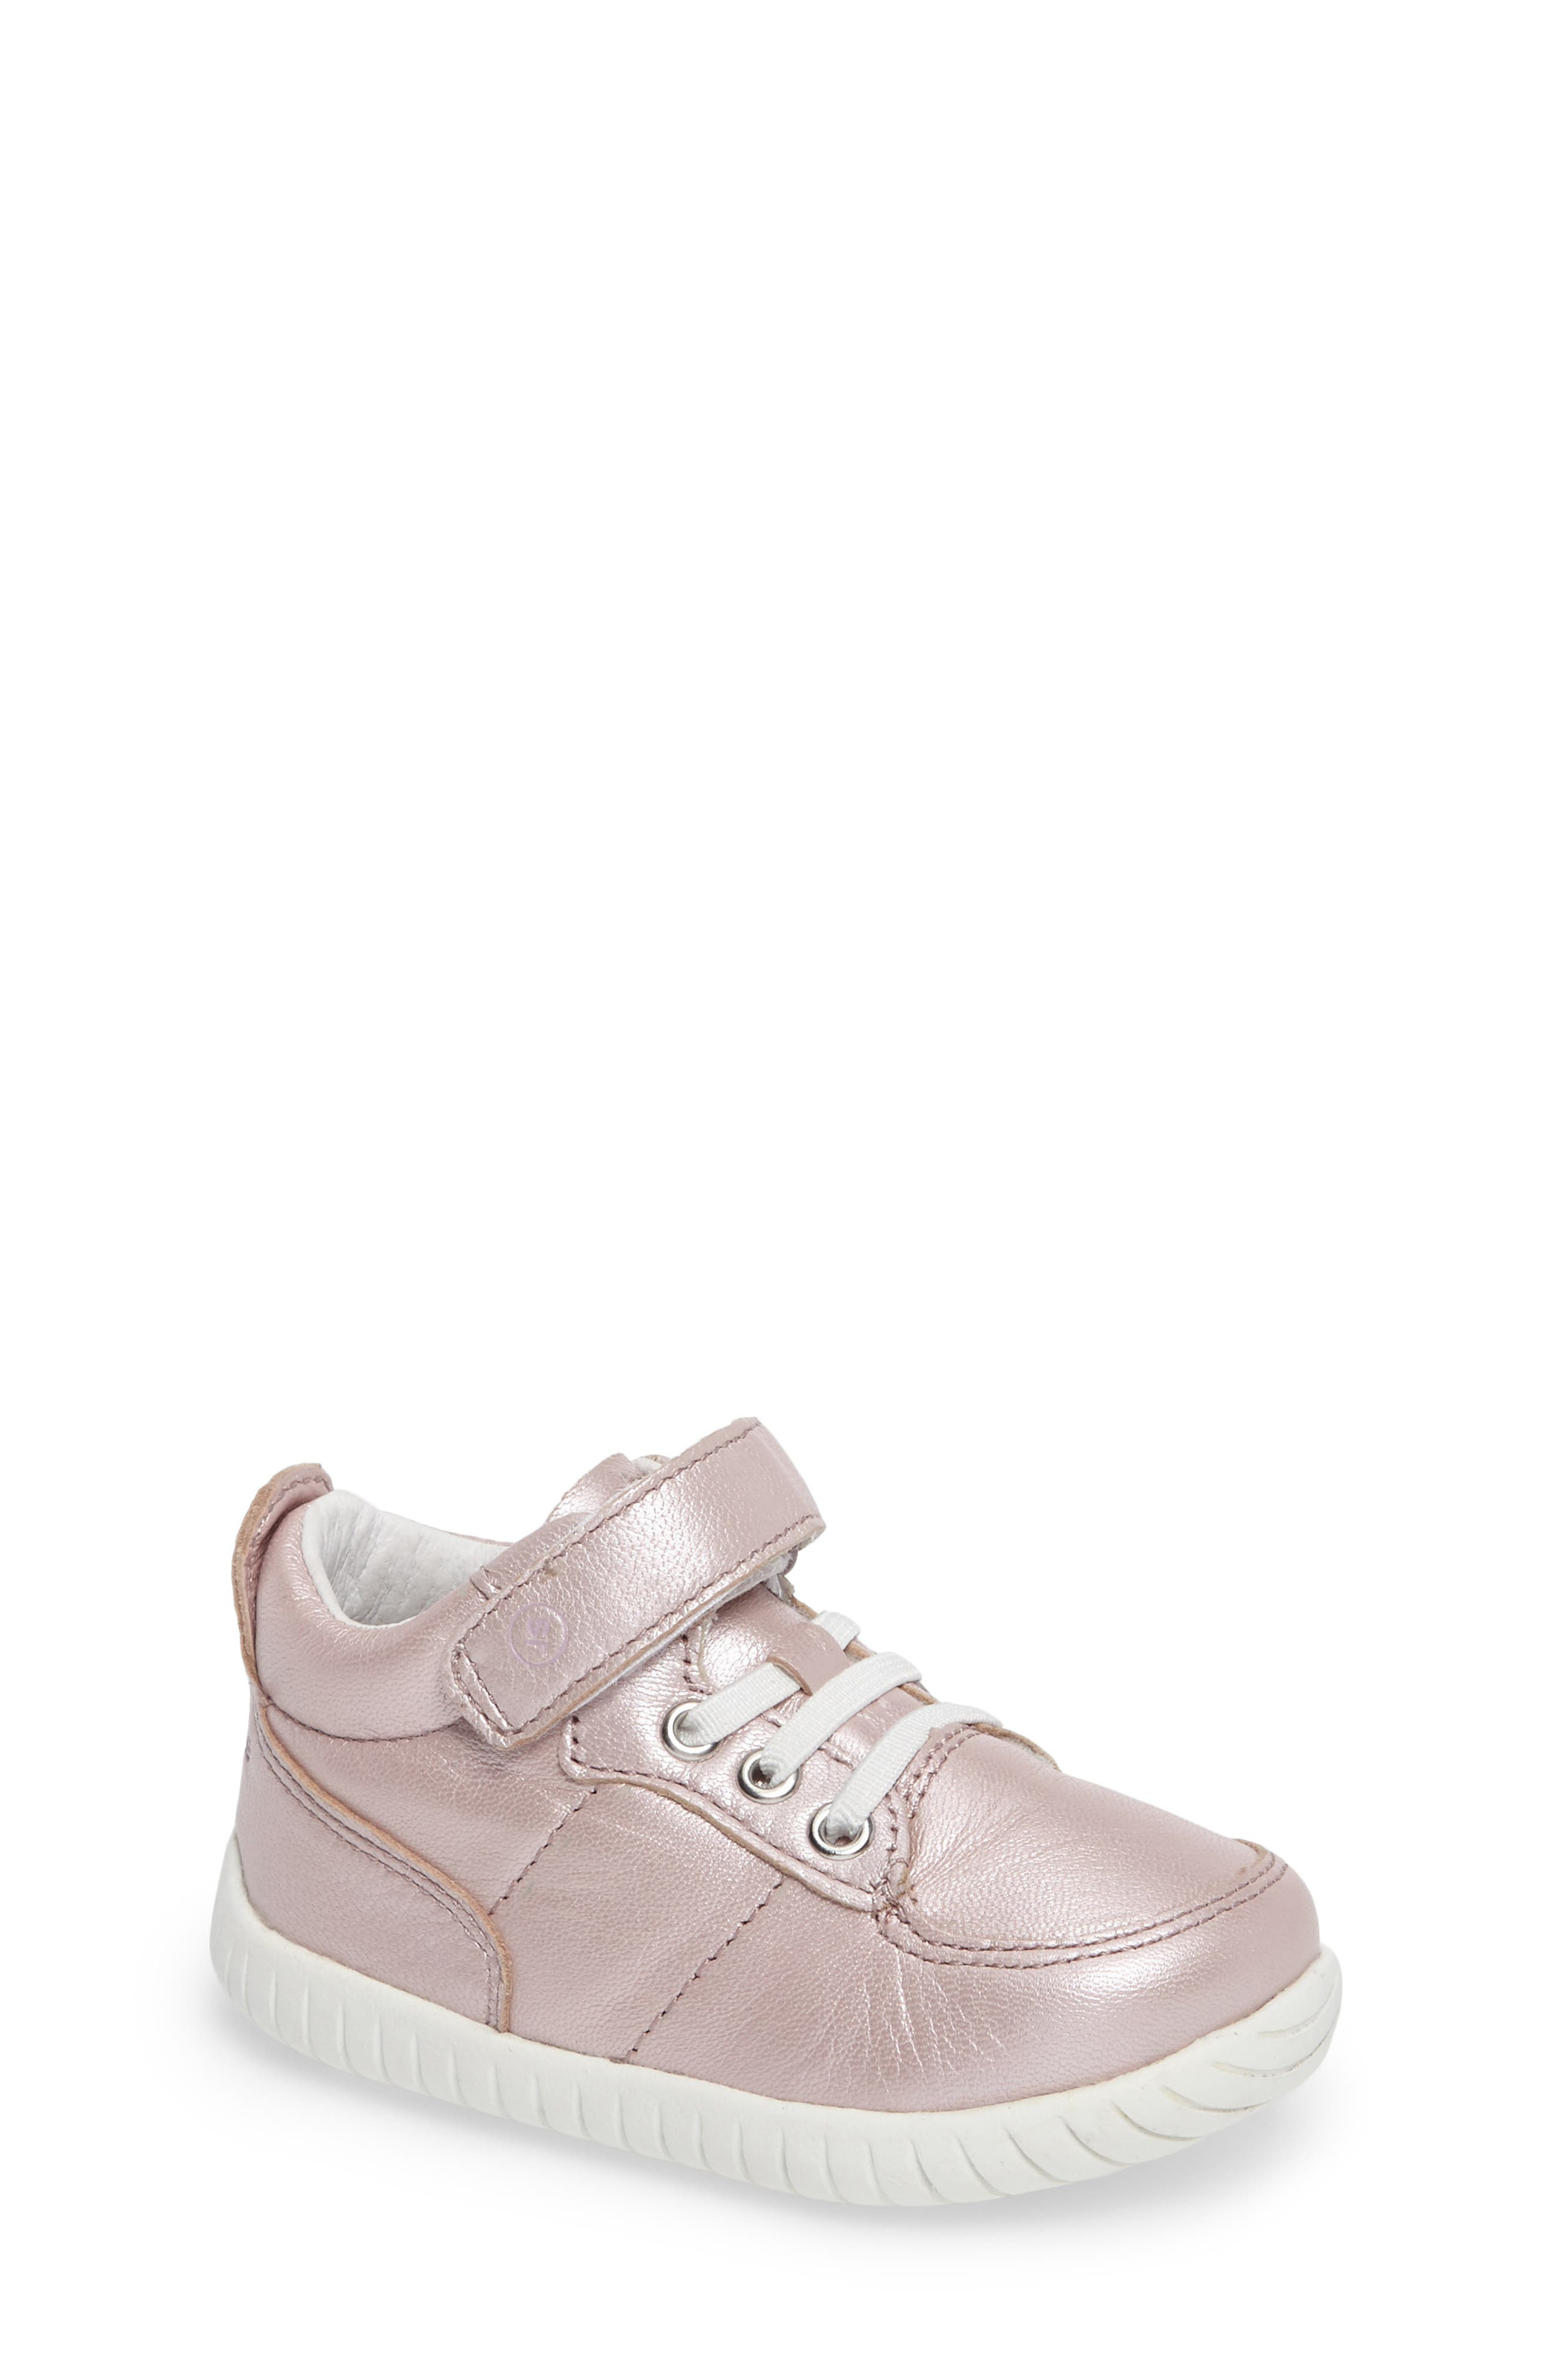 Bailey High Top Sneaker,                         Main,                         color, Pink Metallic